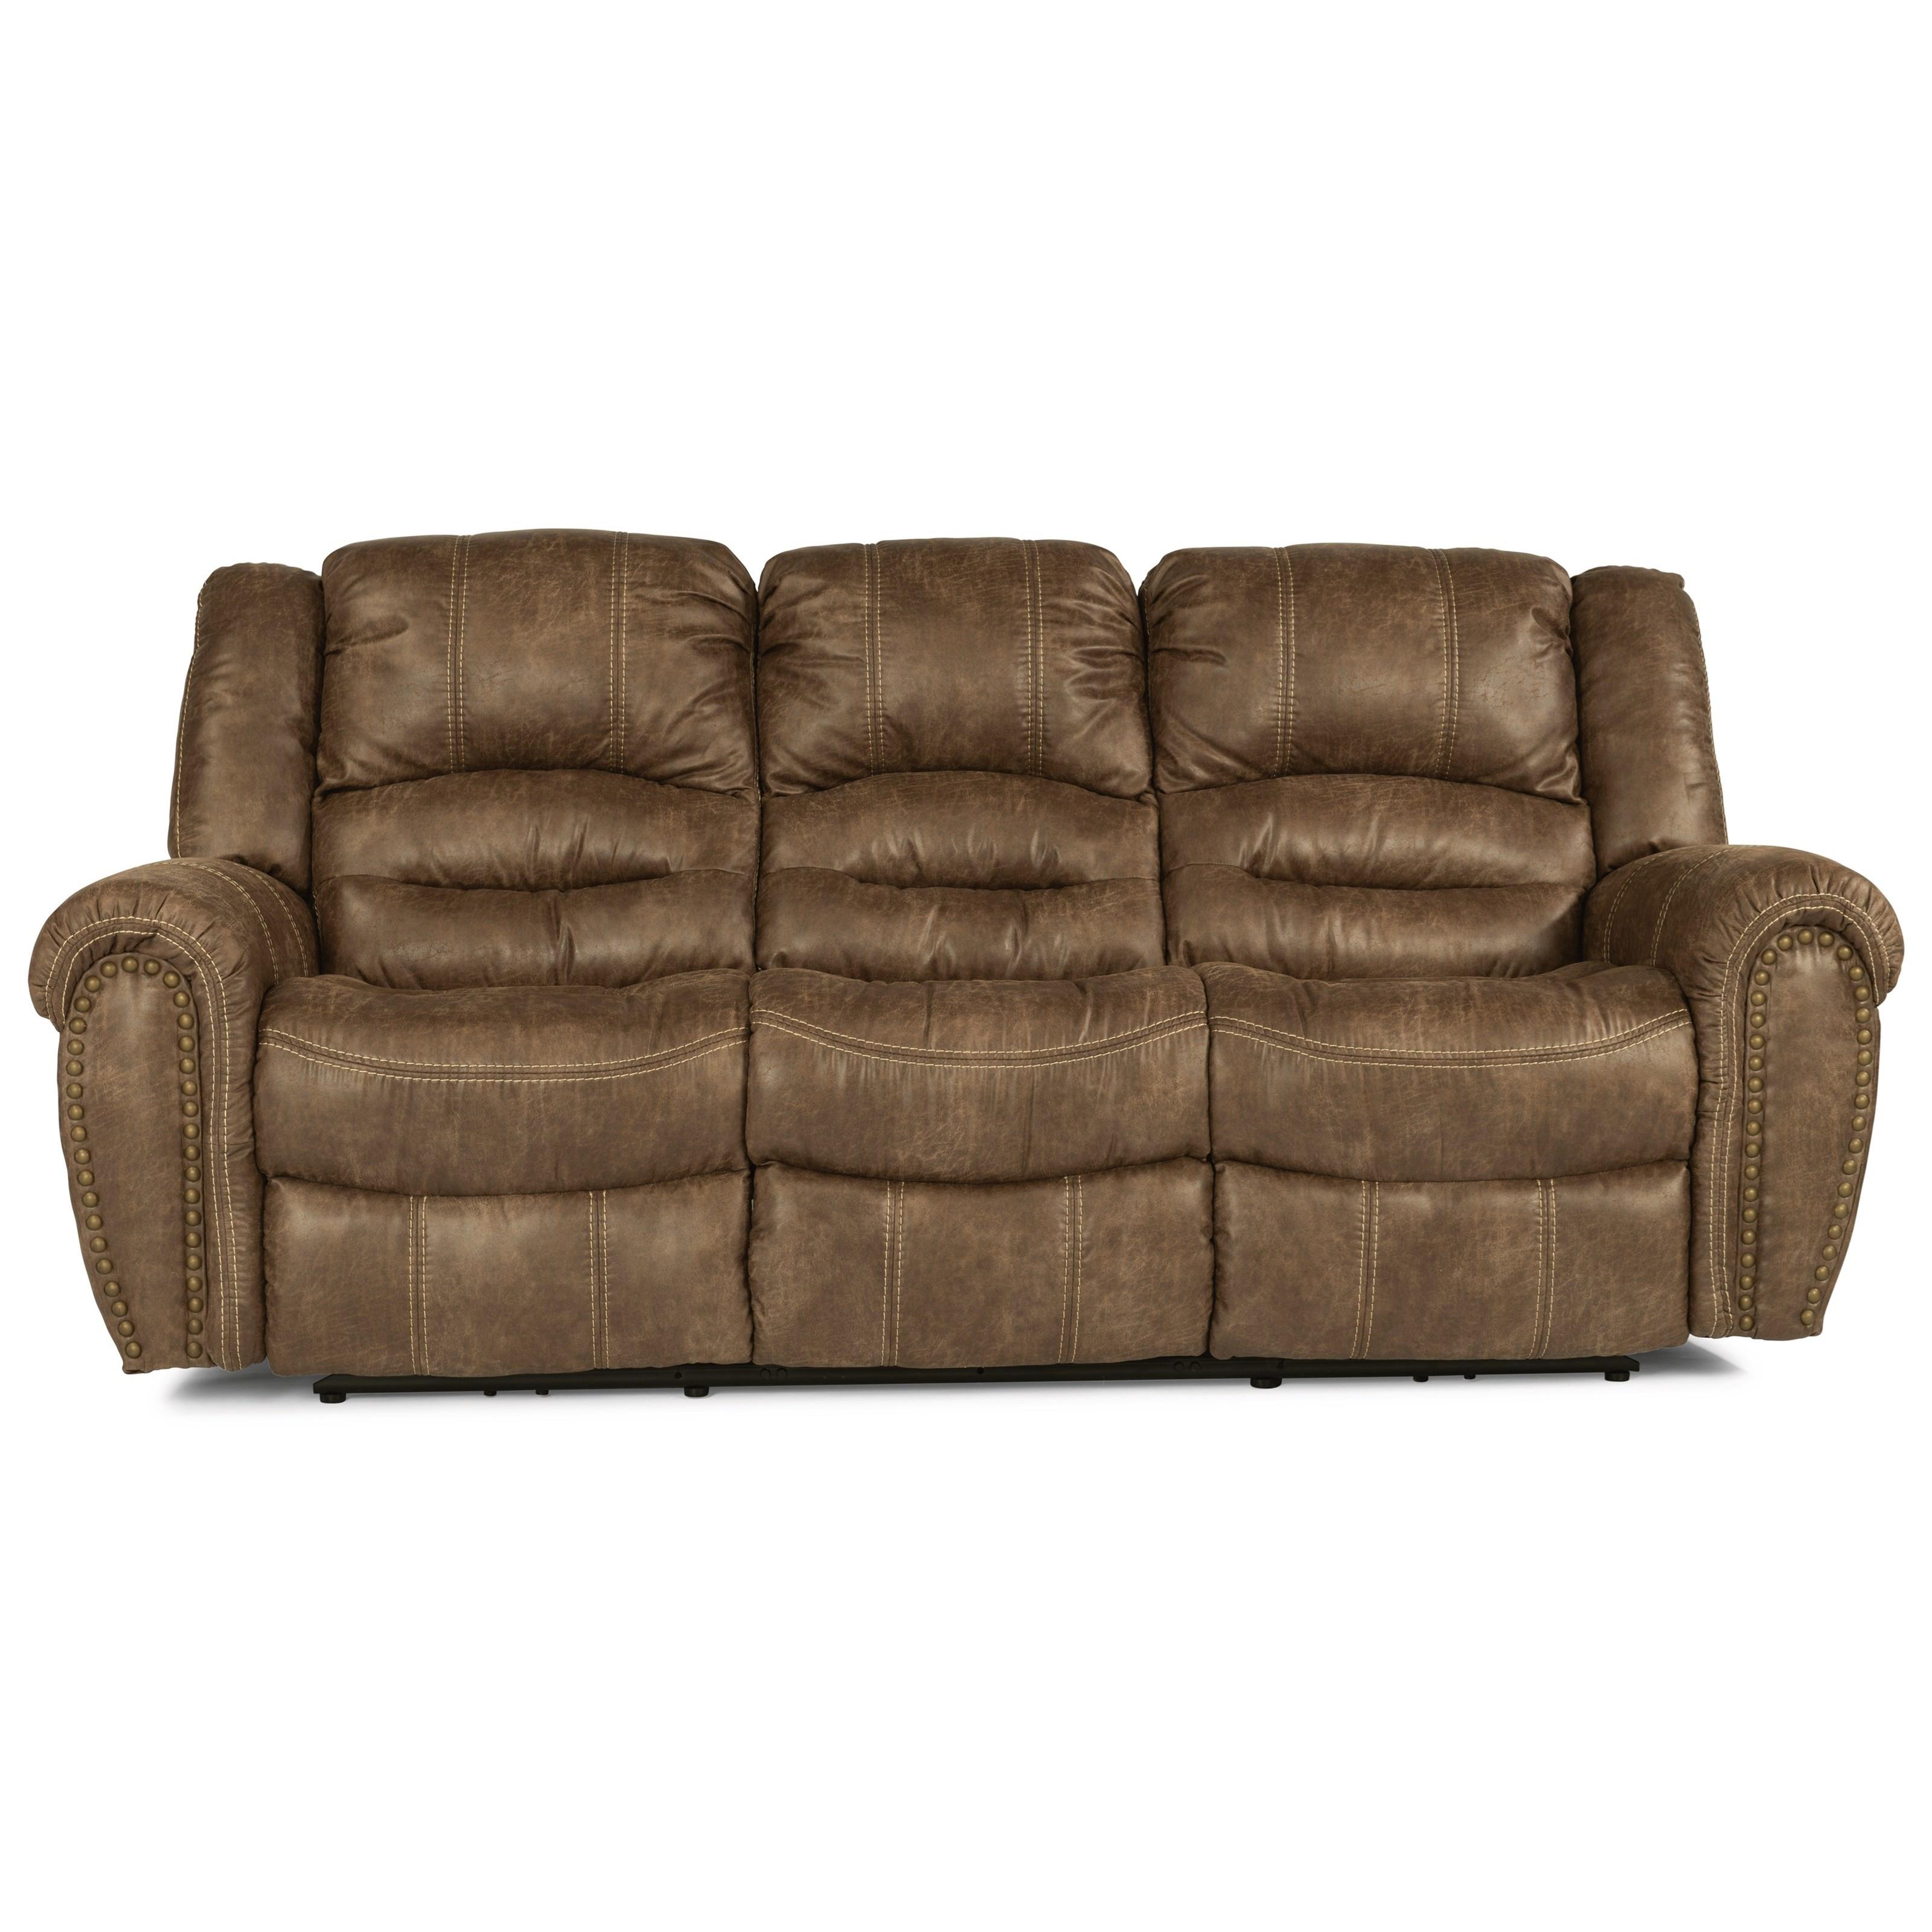 Latitudes - Town Power Reclining Sofa by Flexsteel at Turk Furniture